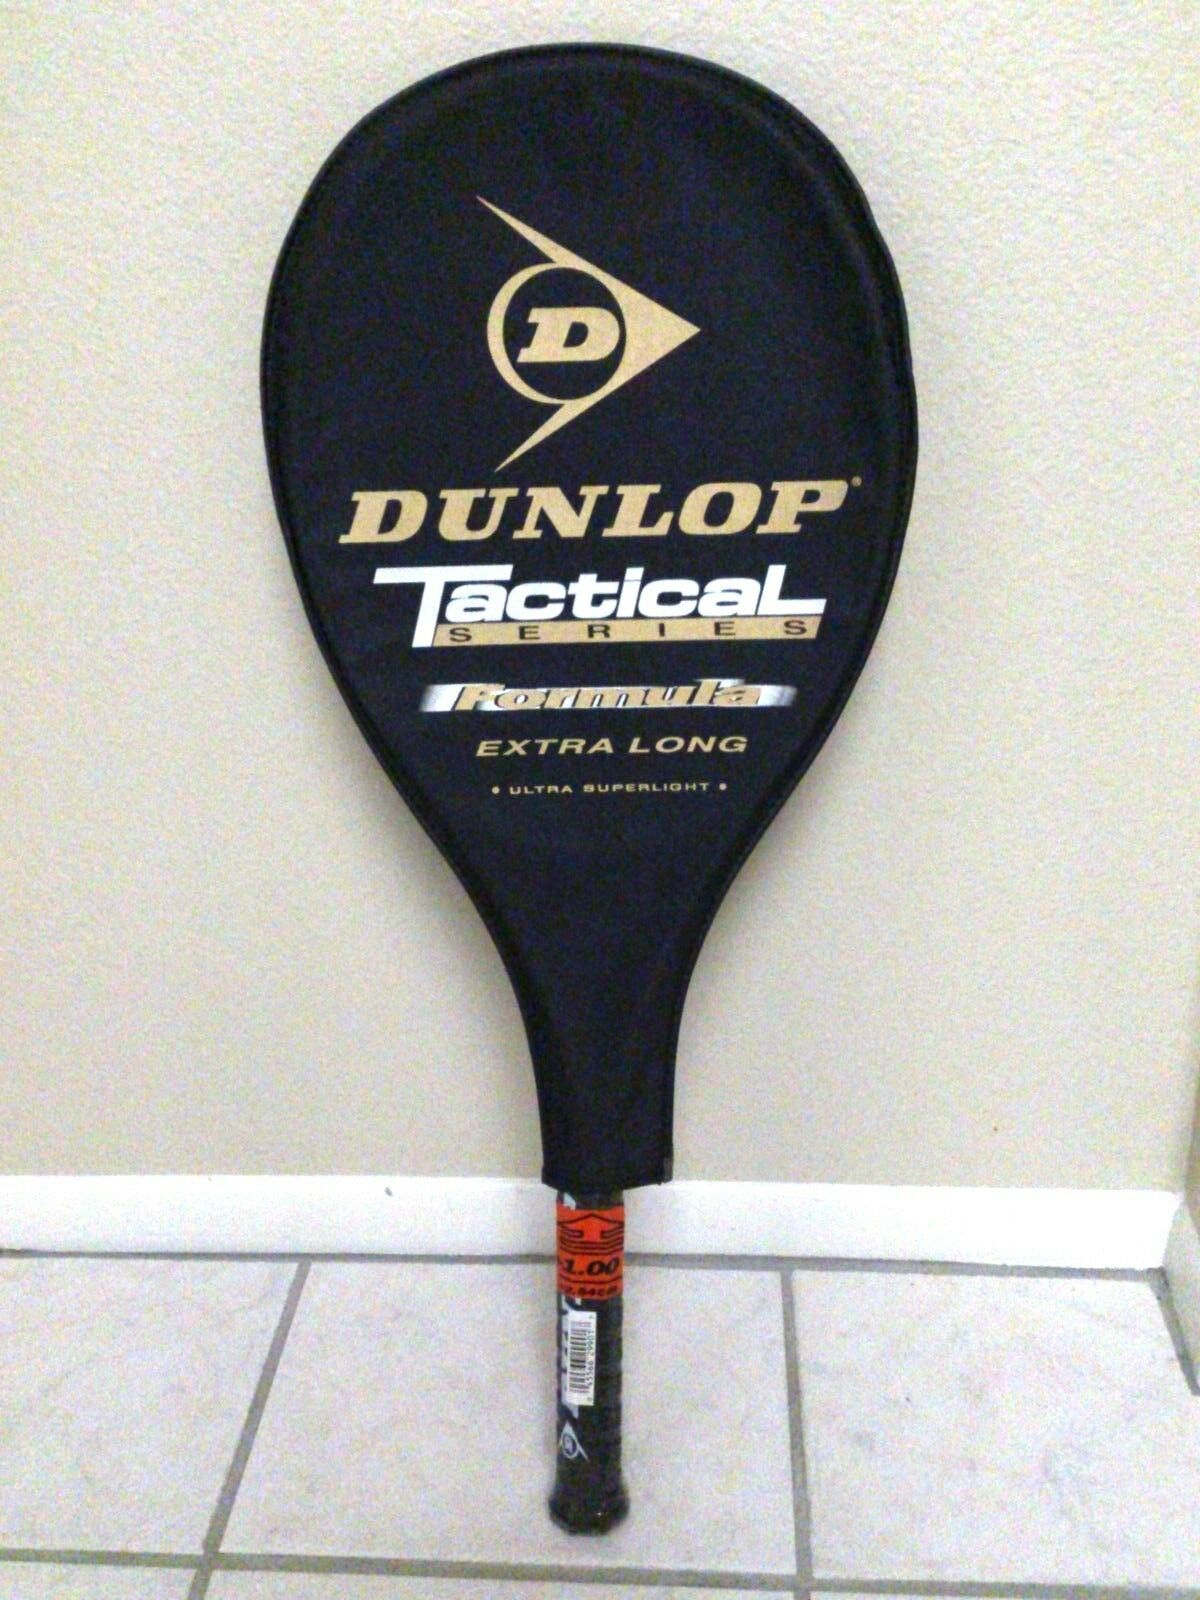 DUNLOP Tactical Formula Tennis Racquet  Extra Long Brand Nuovo Nuovo Brand 4 3/8 e00961